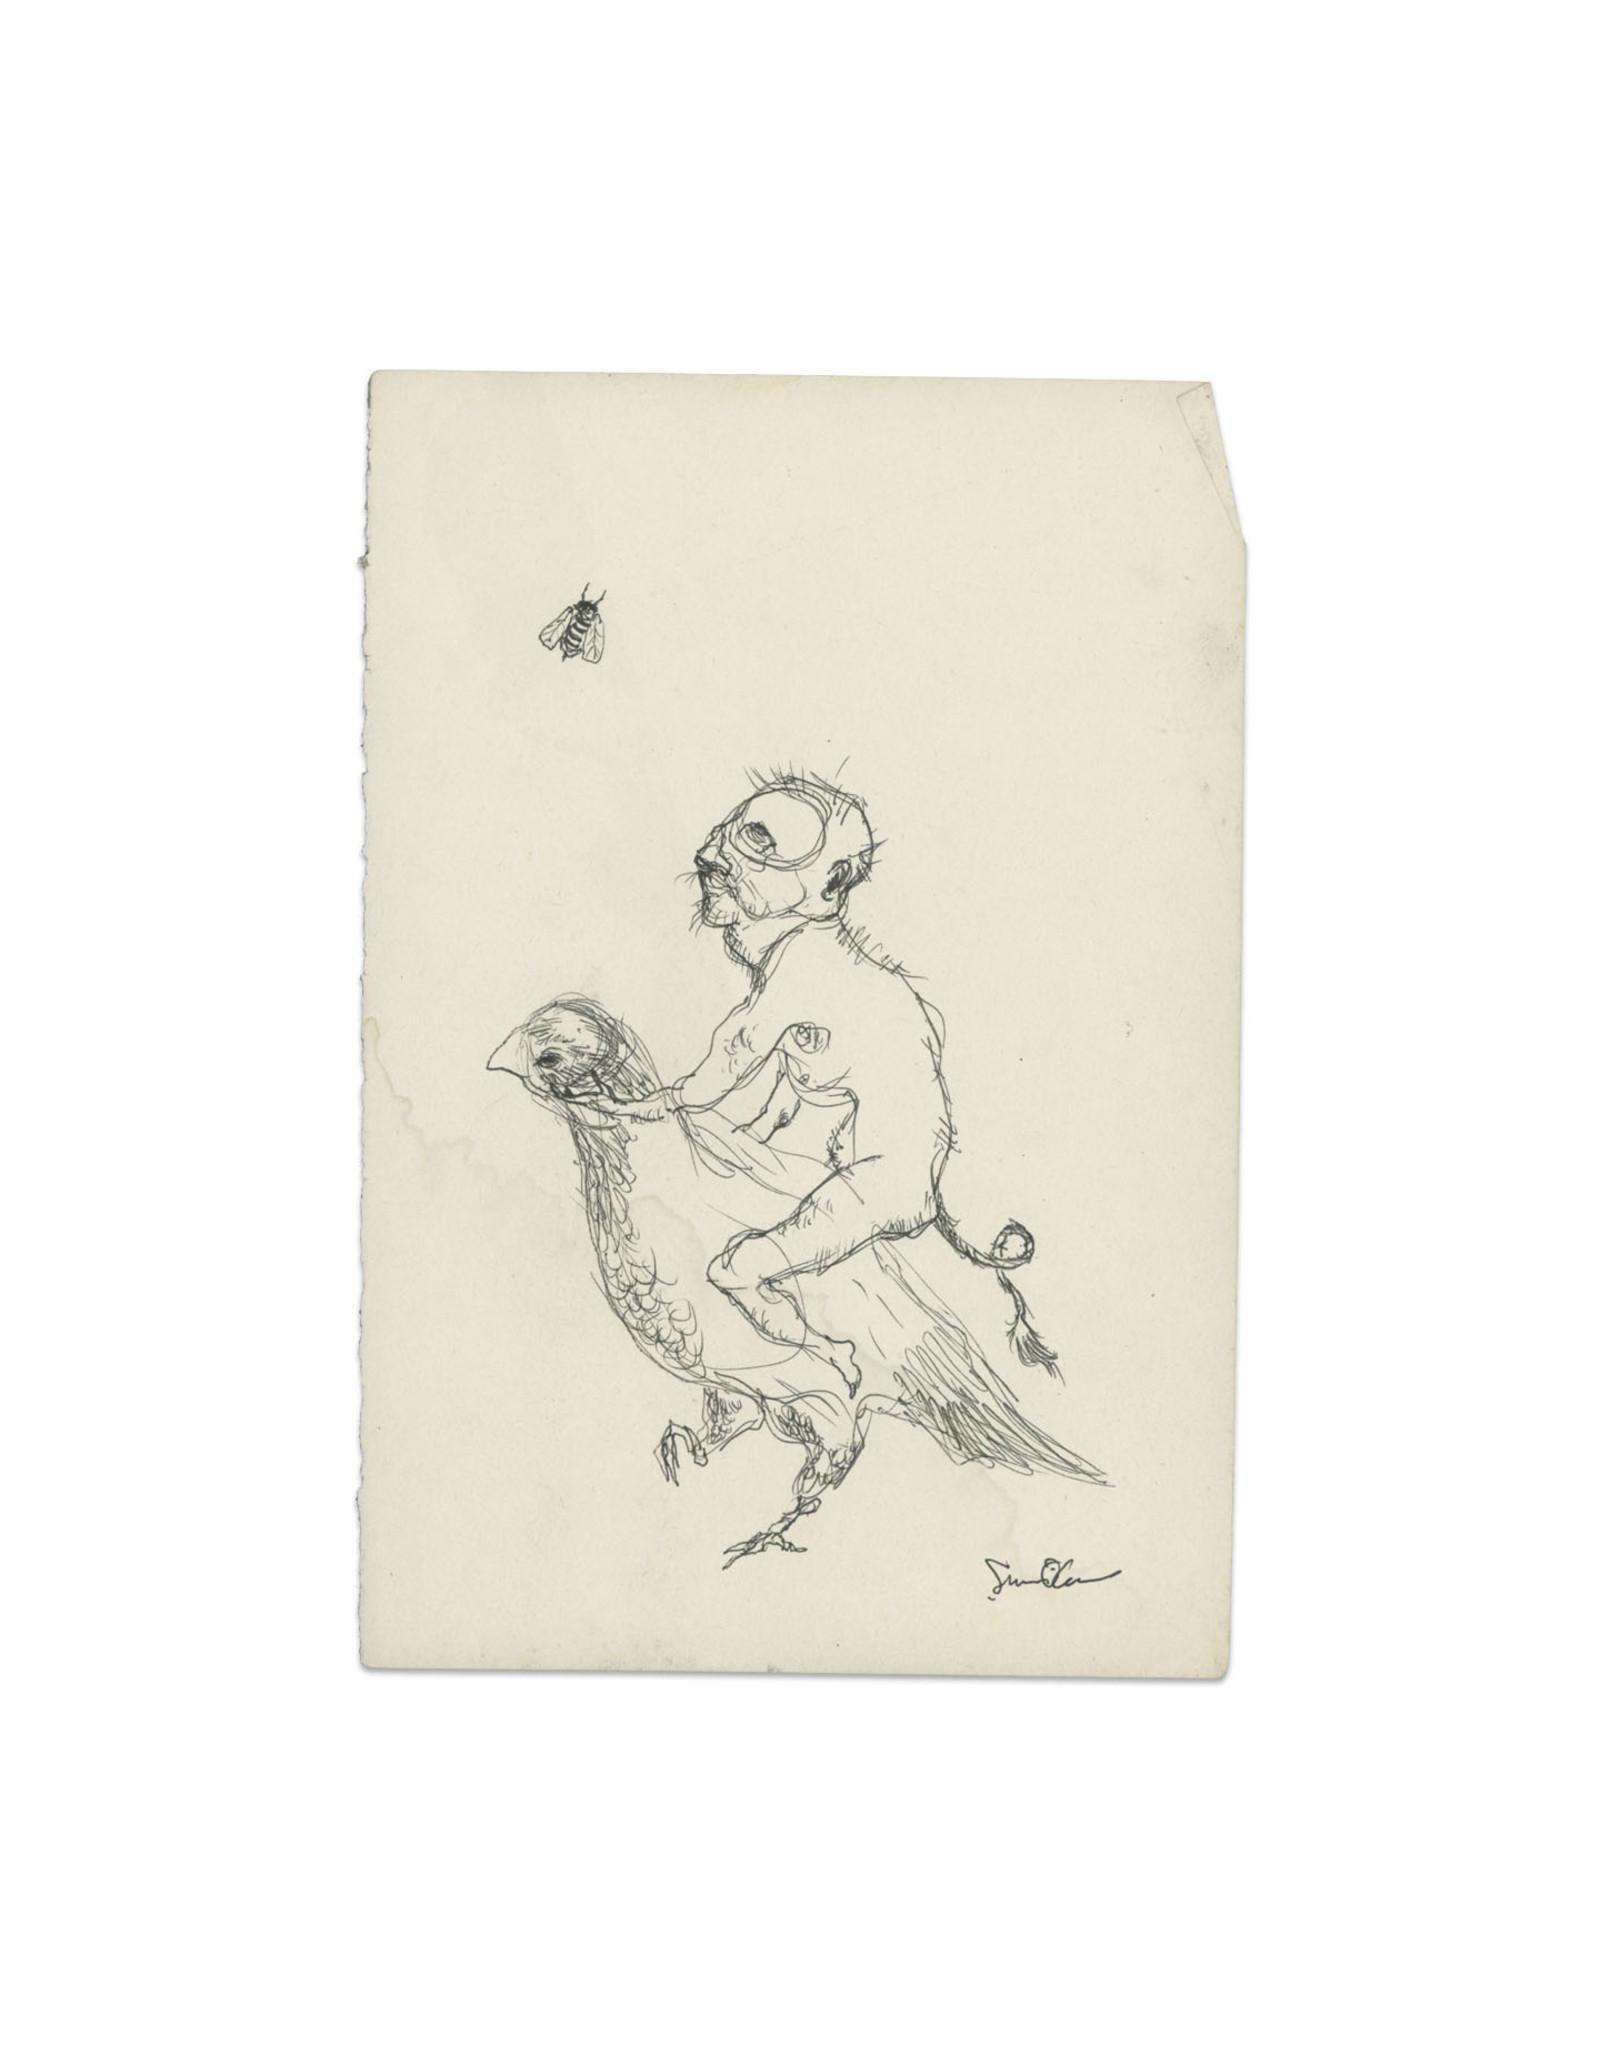 Senan O'Connor Sketchbook Original Drawing No. 2